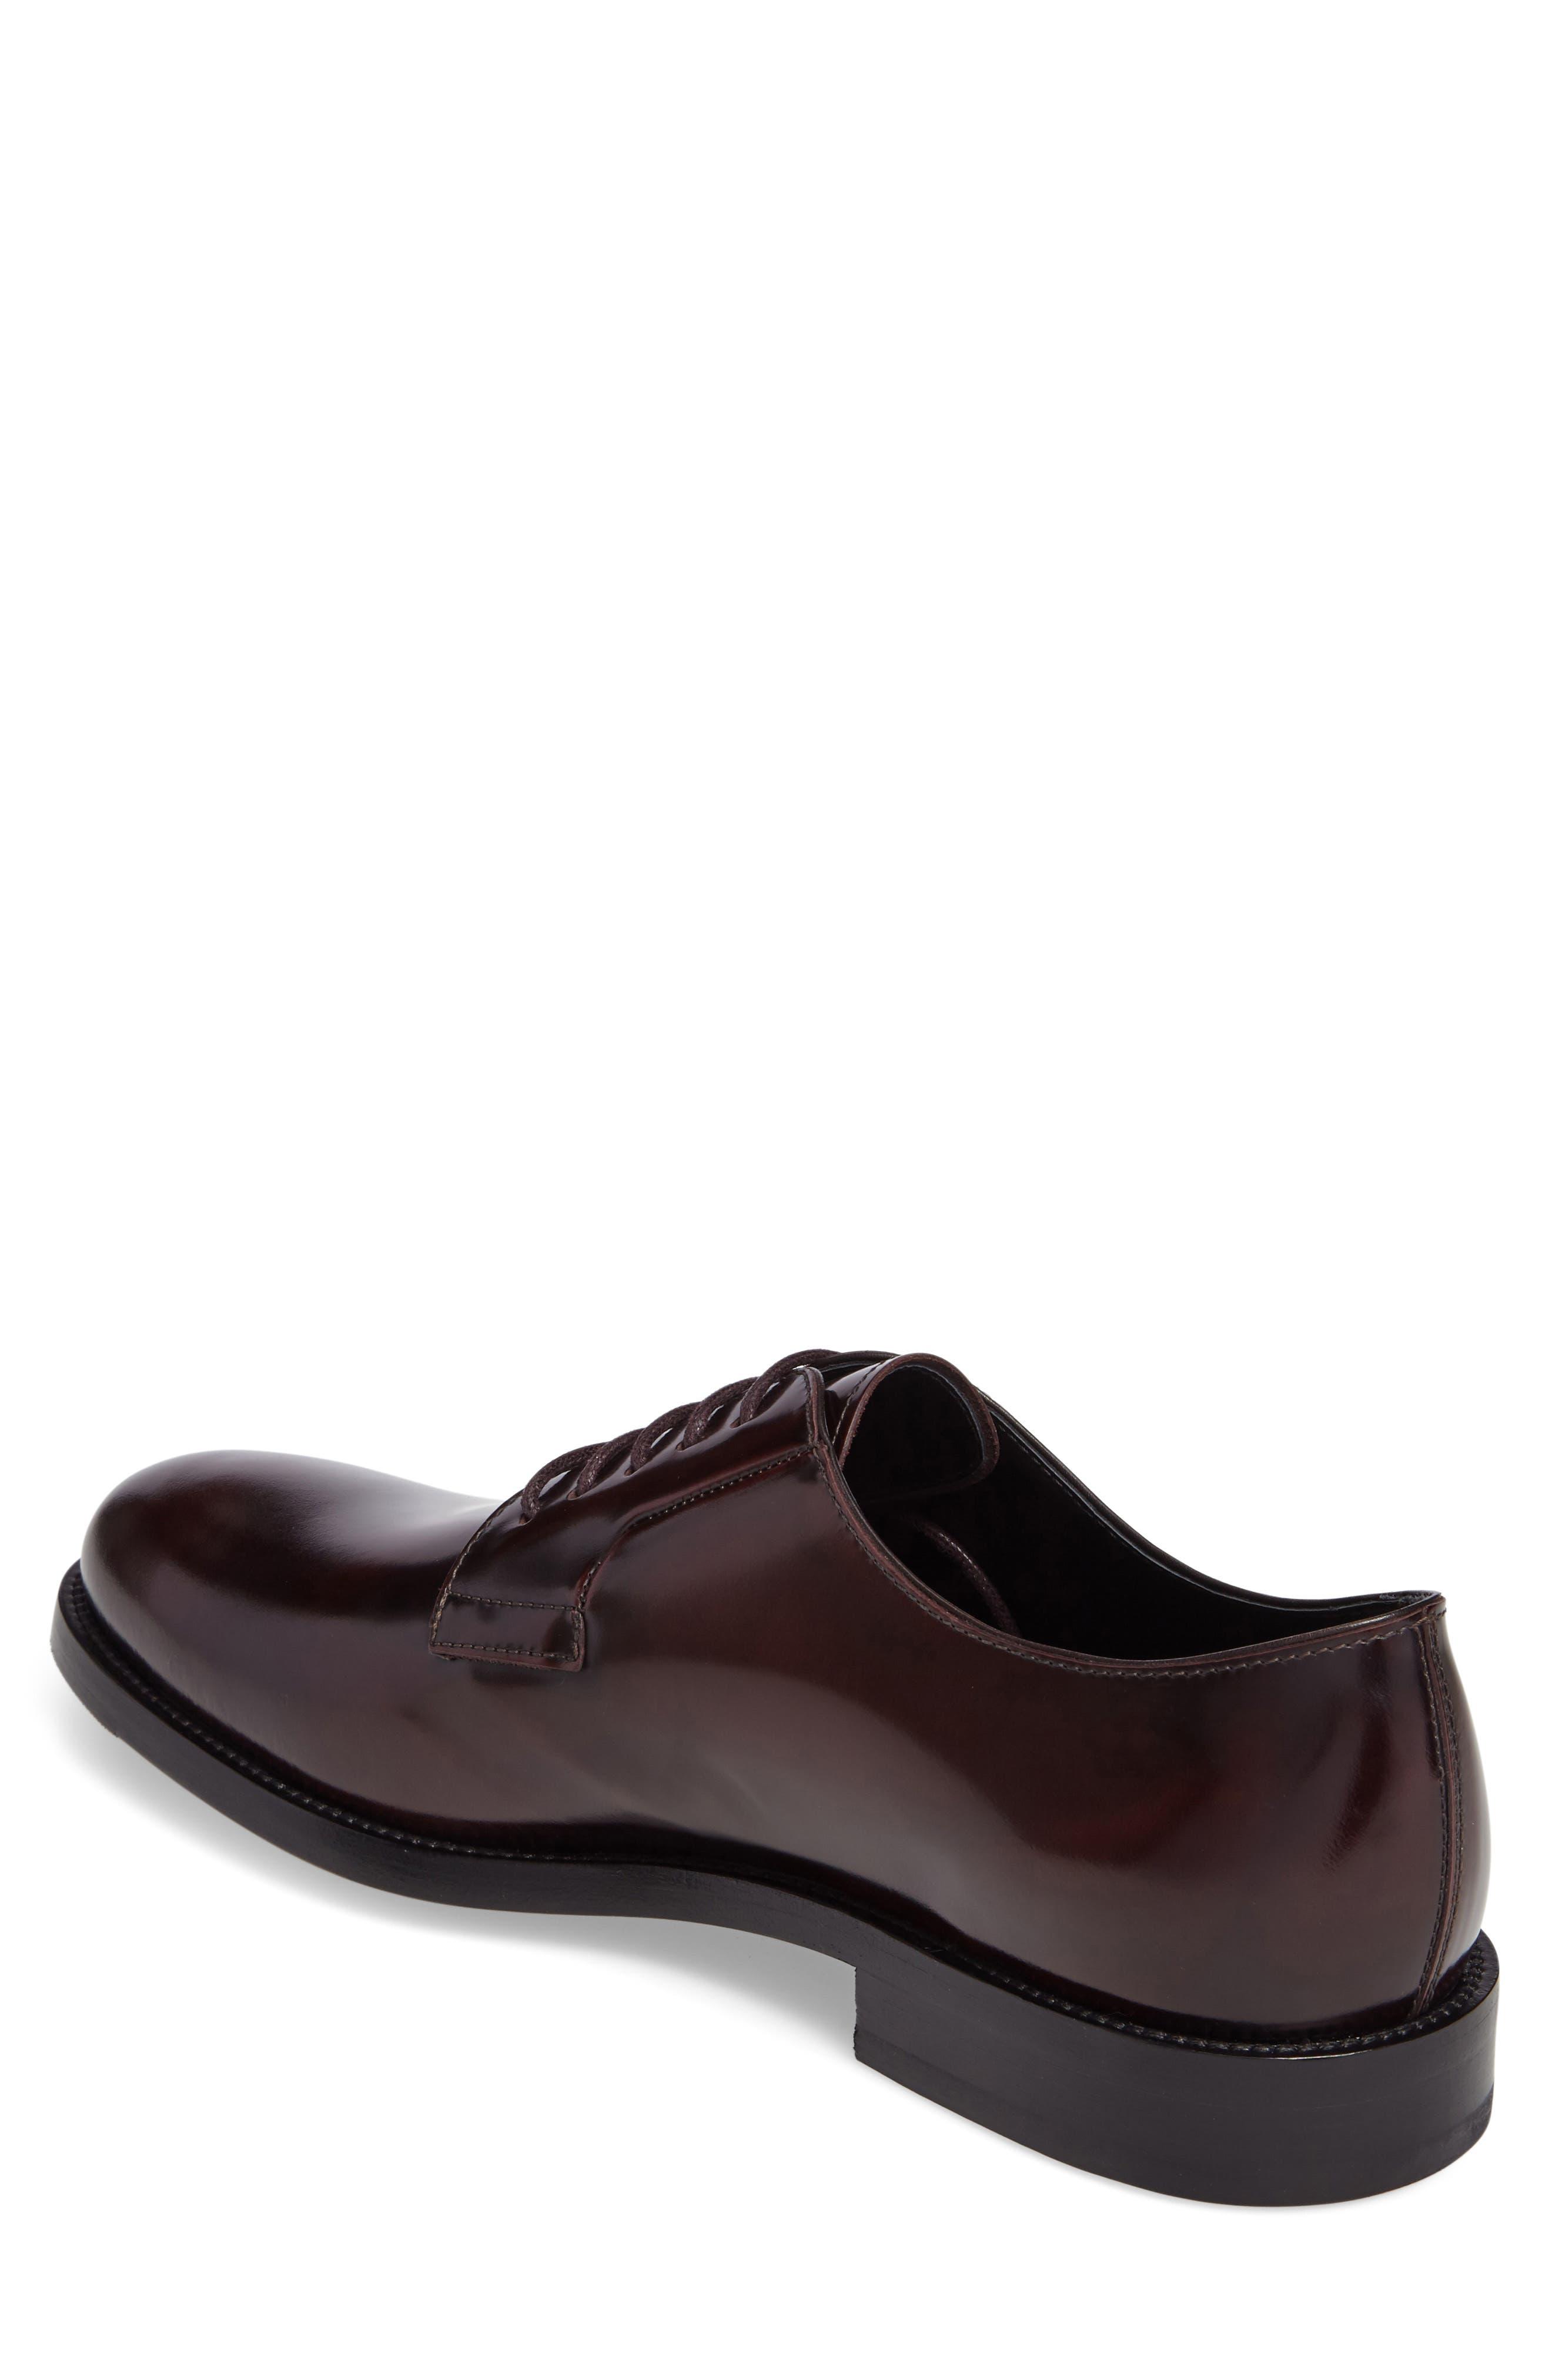 Plain Toe Derby,                             Alternate thumbnail 2, color,                             Burgundy Leather